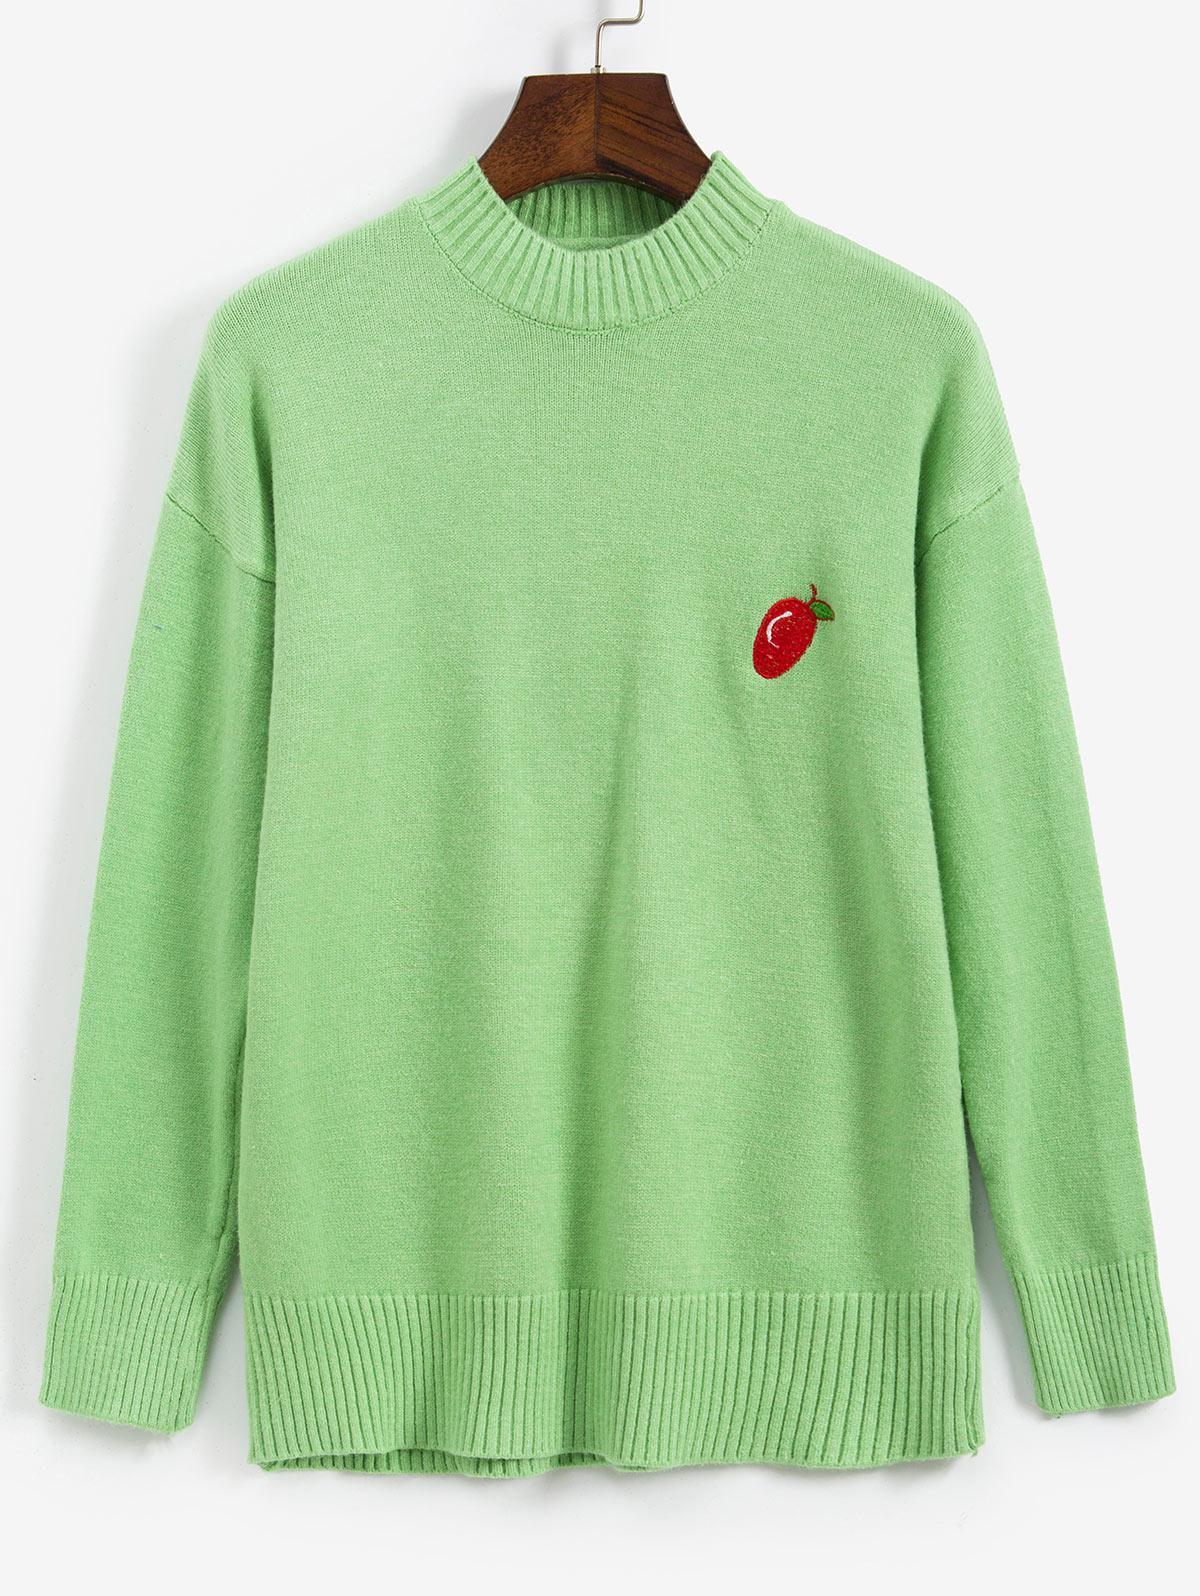 Fruit Embroidered Drop Shoulder Sweater